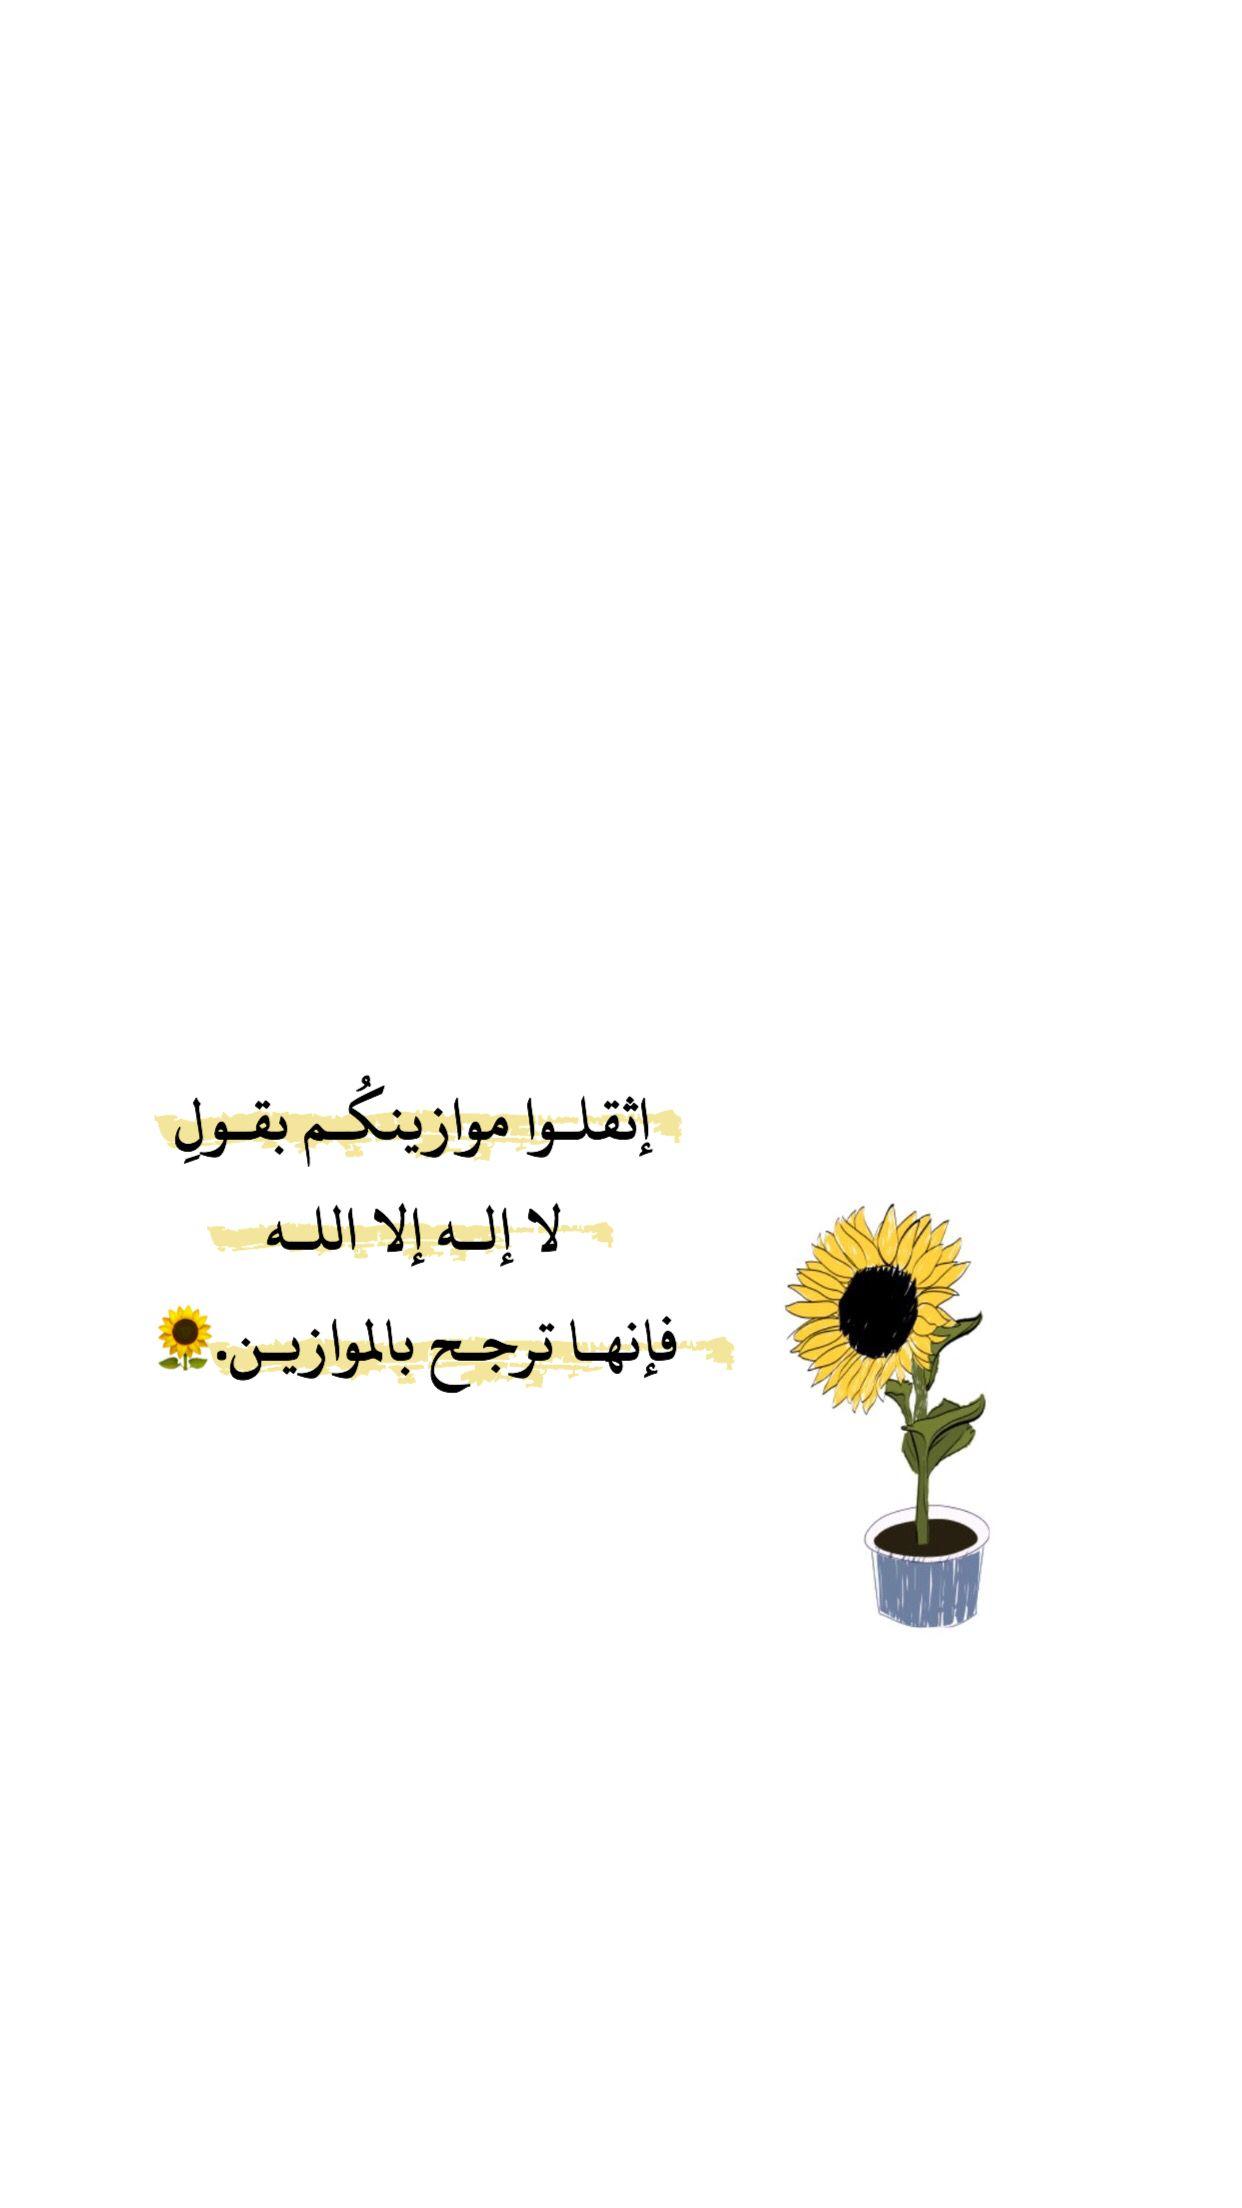 سبحان الله والحمدالله Quran Quotes Love Funny Arabic Quotes Islamic Inspirational Quotes